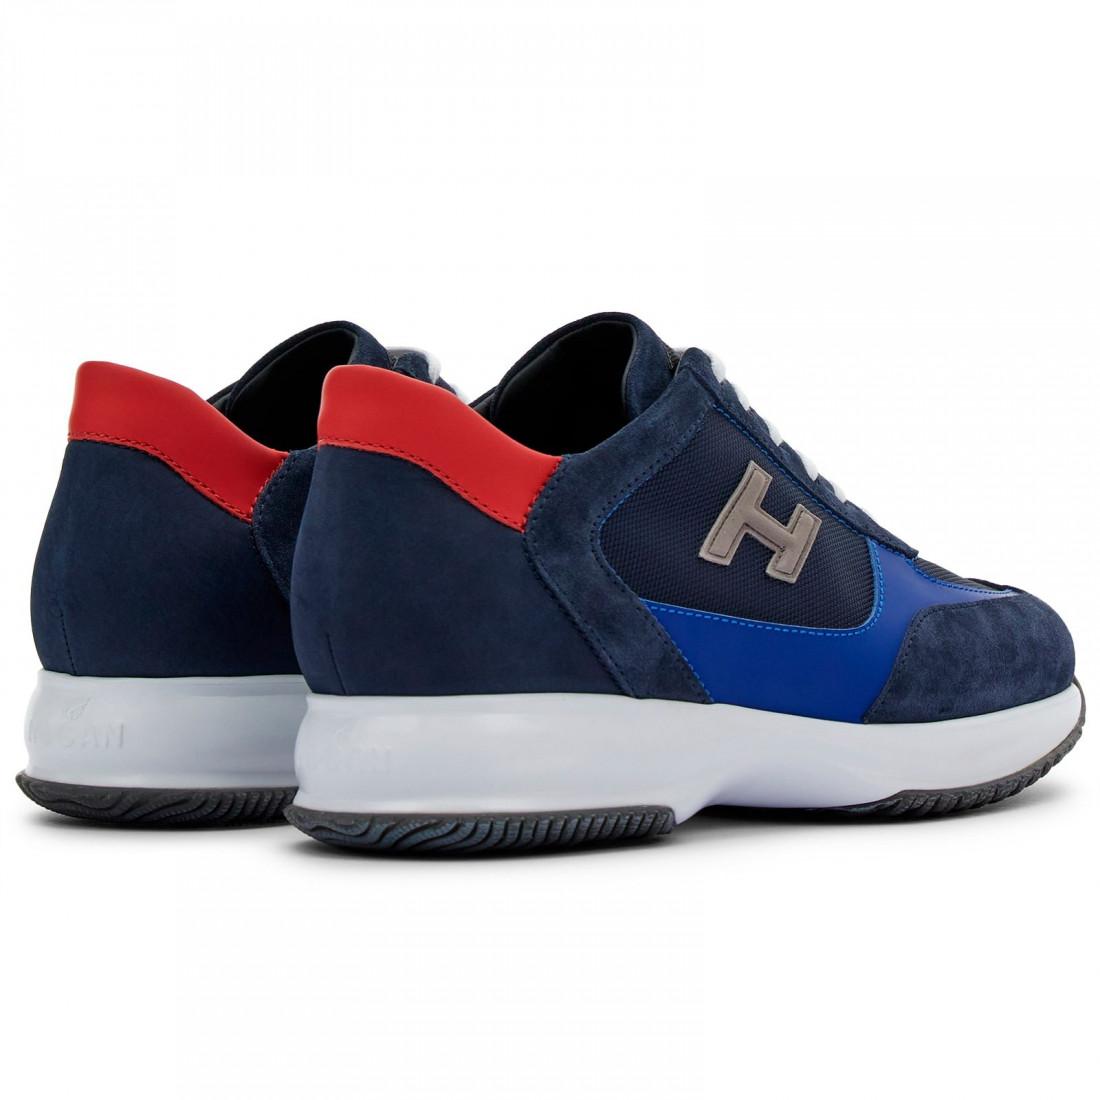 Hogan Interactive sneaker da uomo blu e rossa in suede e tessuto